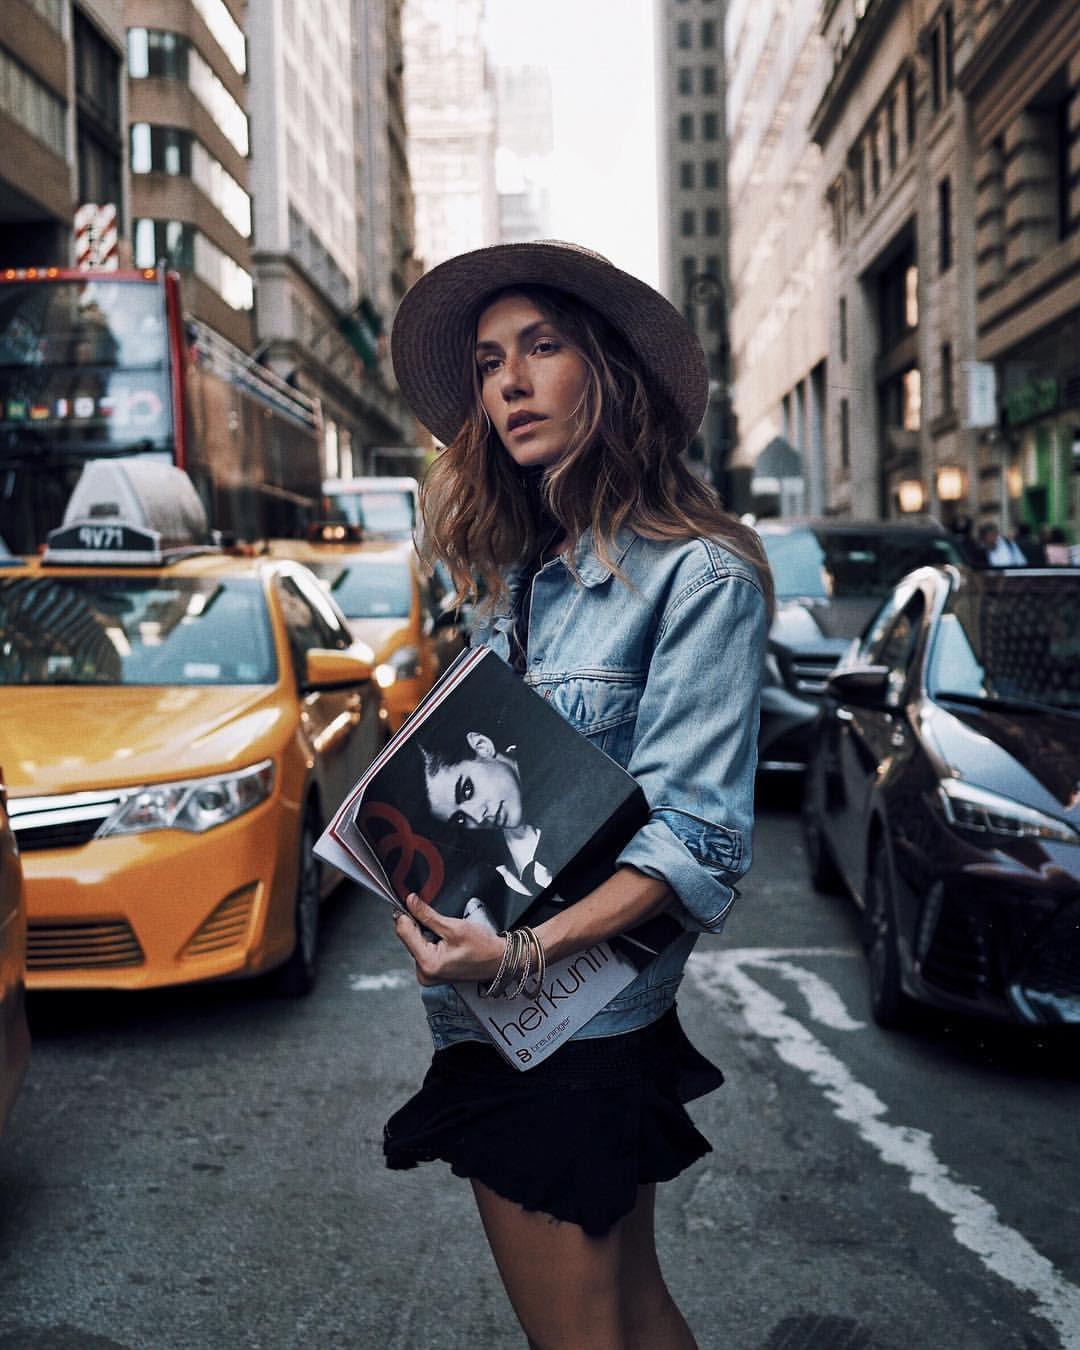 Paparazzi Jelena Cikoja nude photos 2019